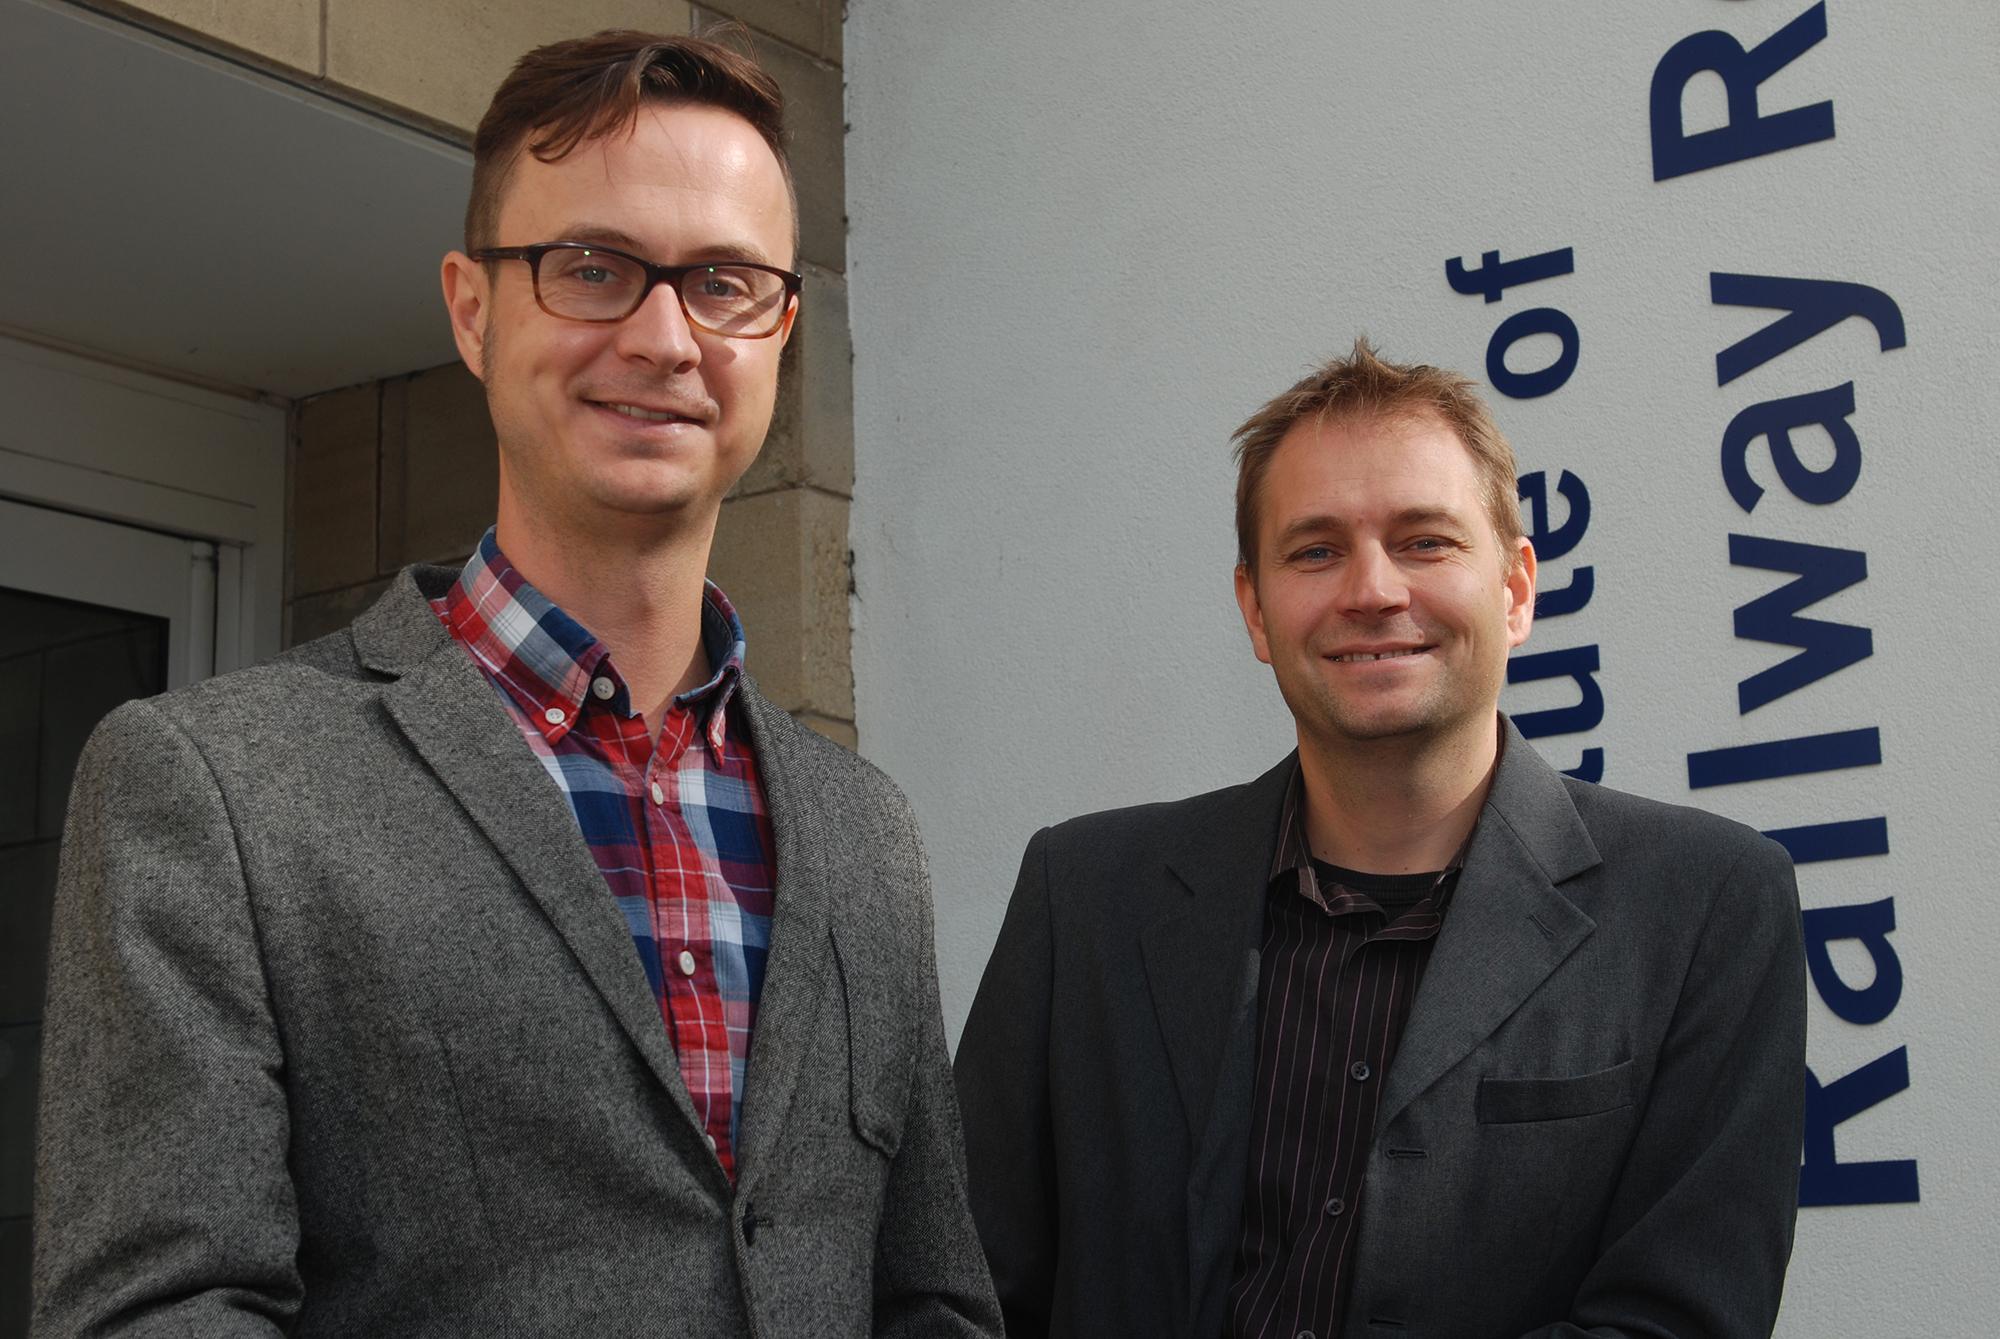 Huddersfield Railway Researchers Win Top IMechE Award